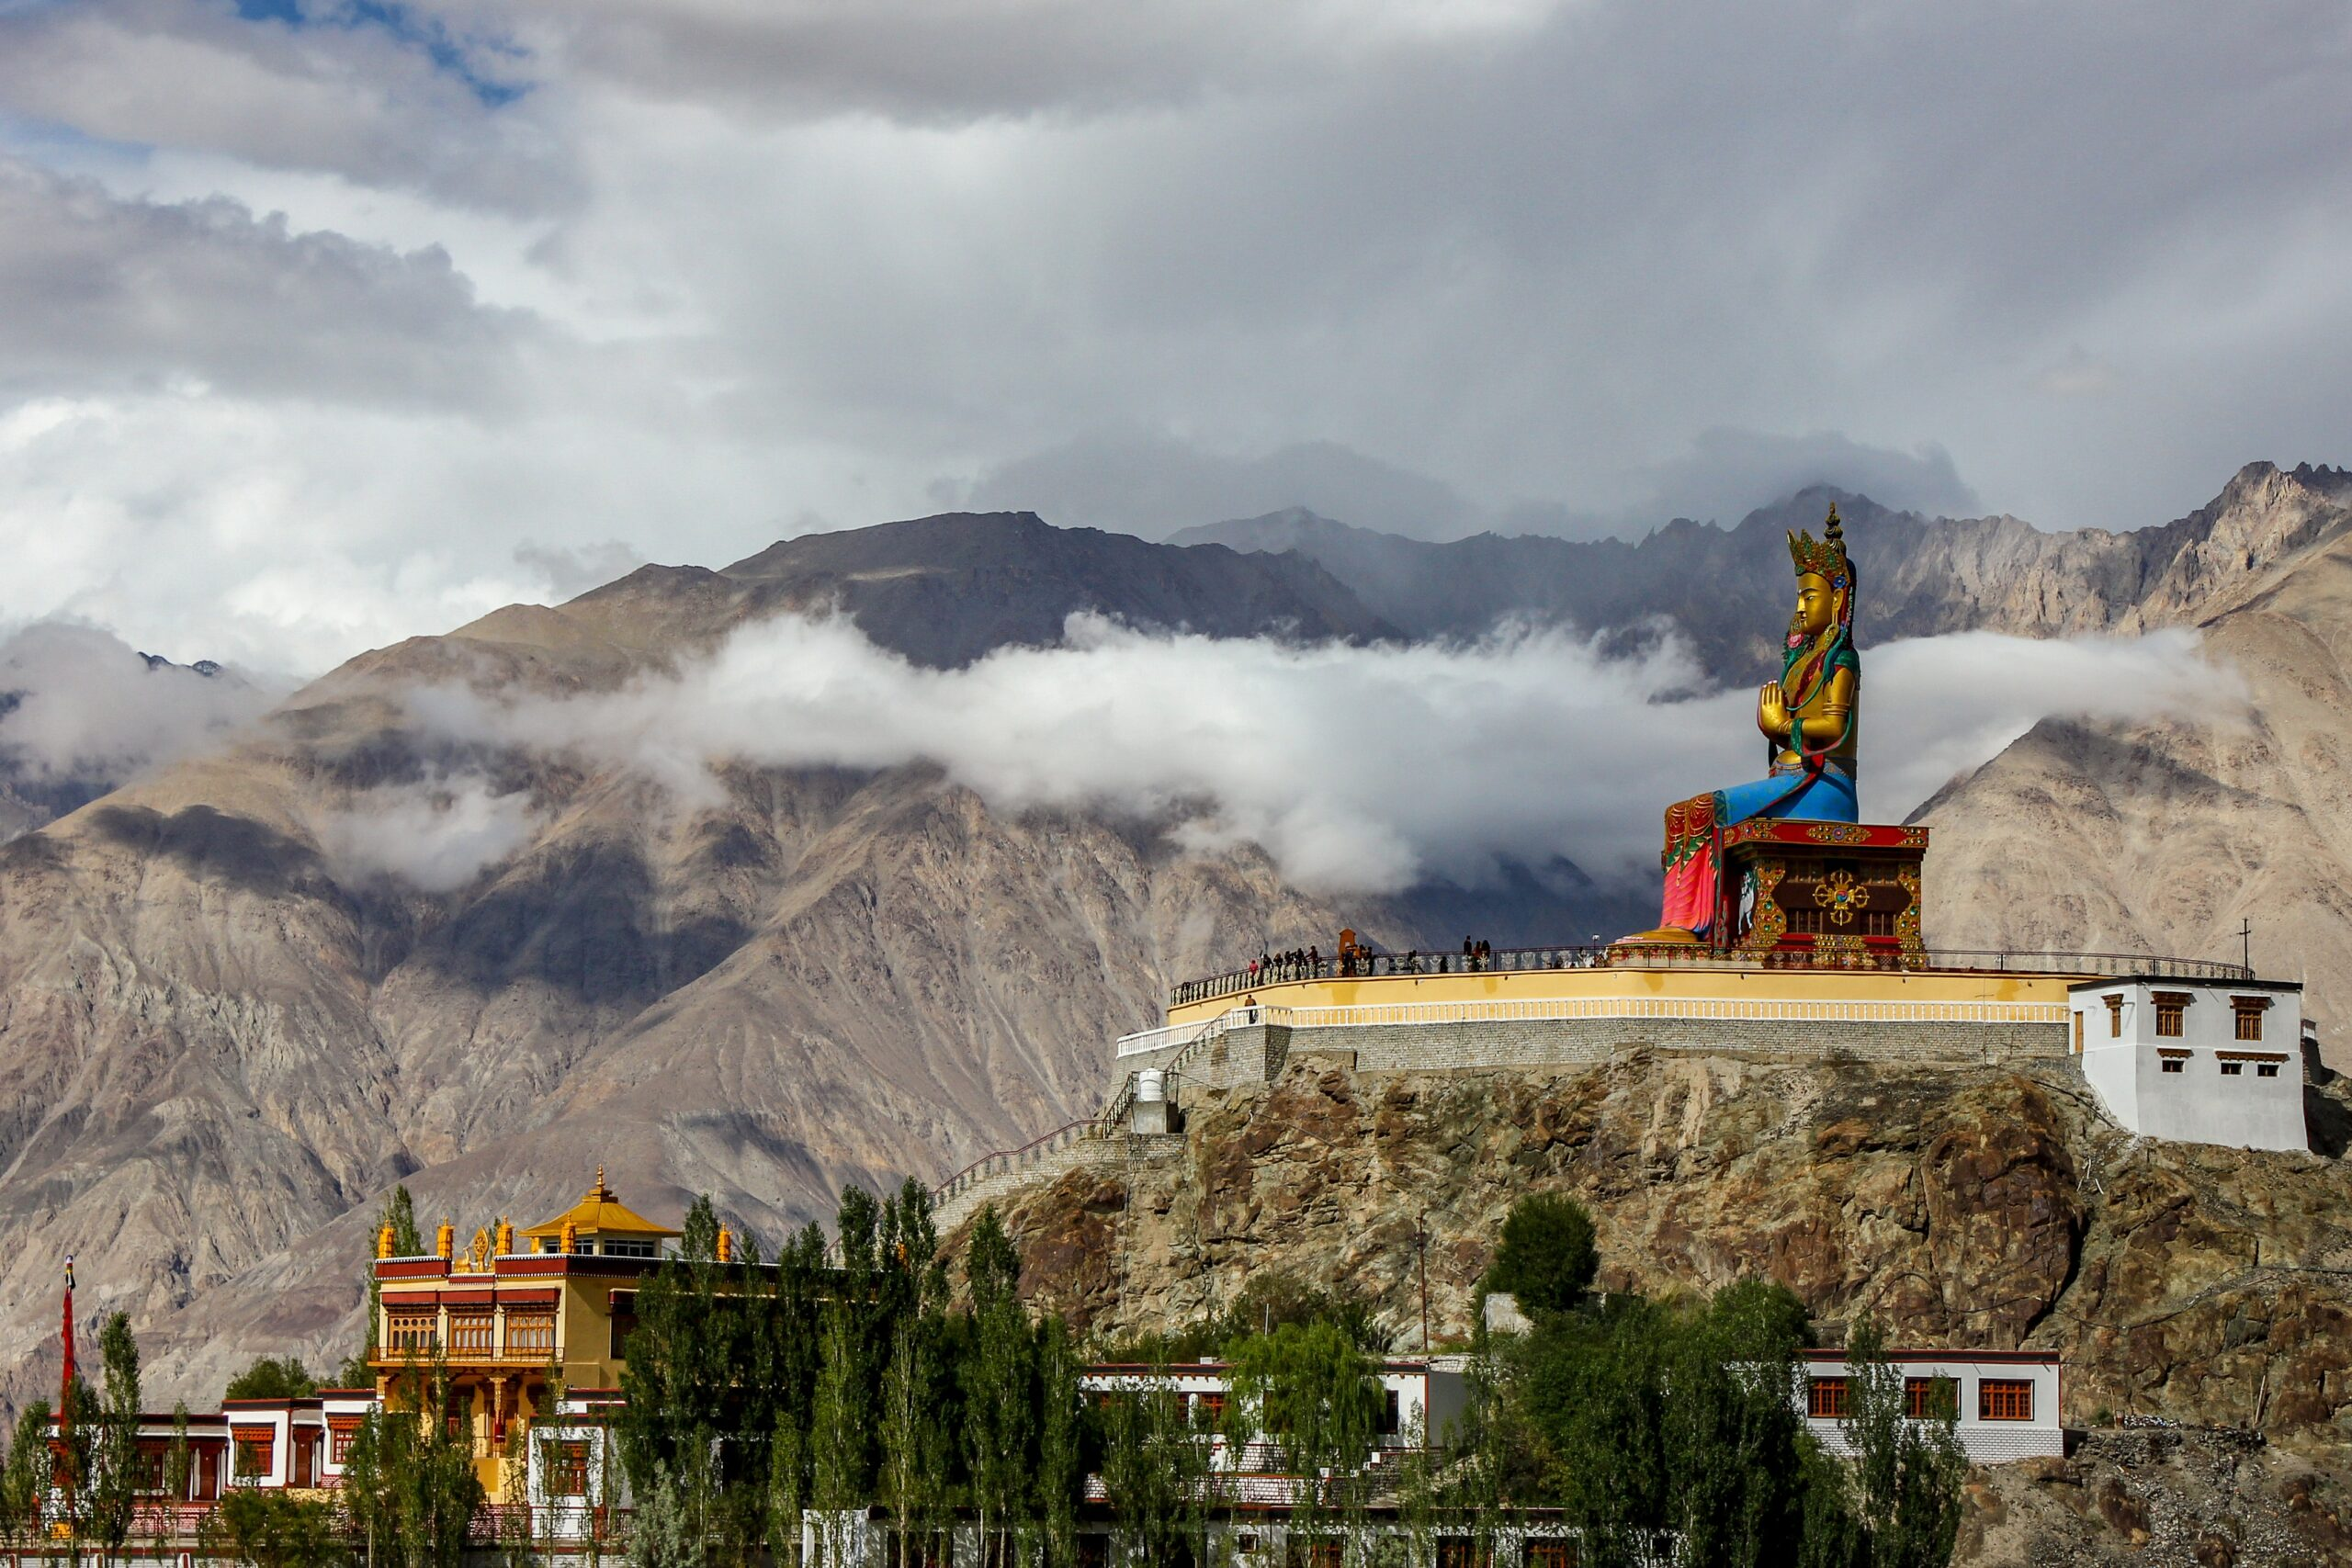 ashram, budda, tempio buddista, vita spirituale, stili di vita alternativi, viaggiare con lentezza, slow travel